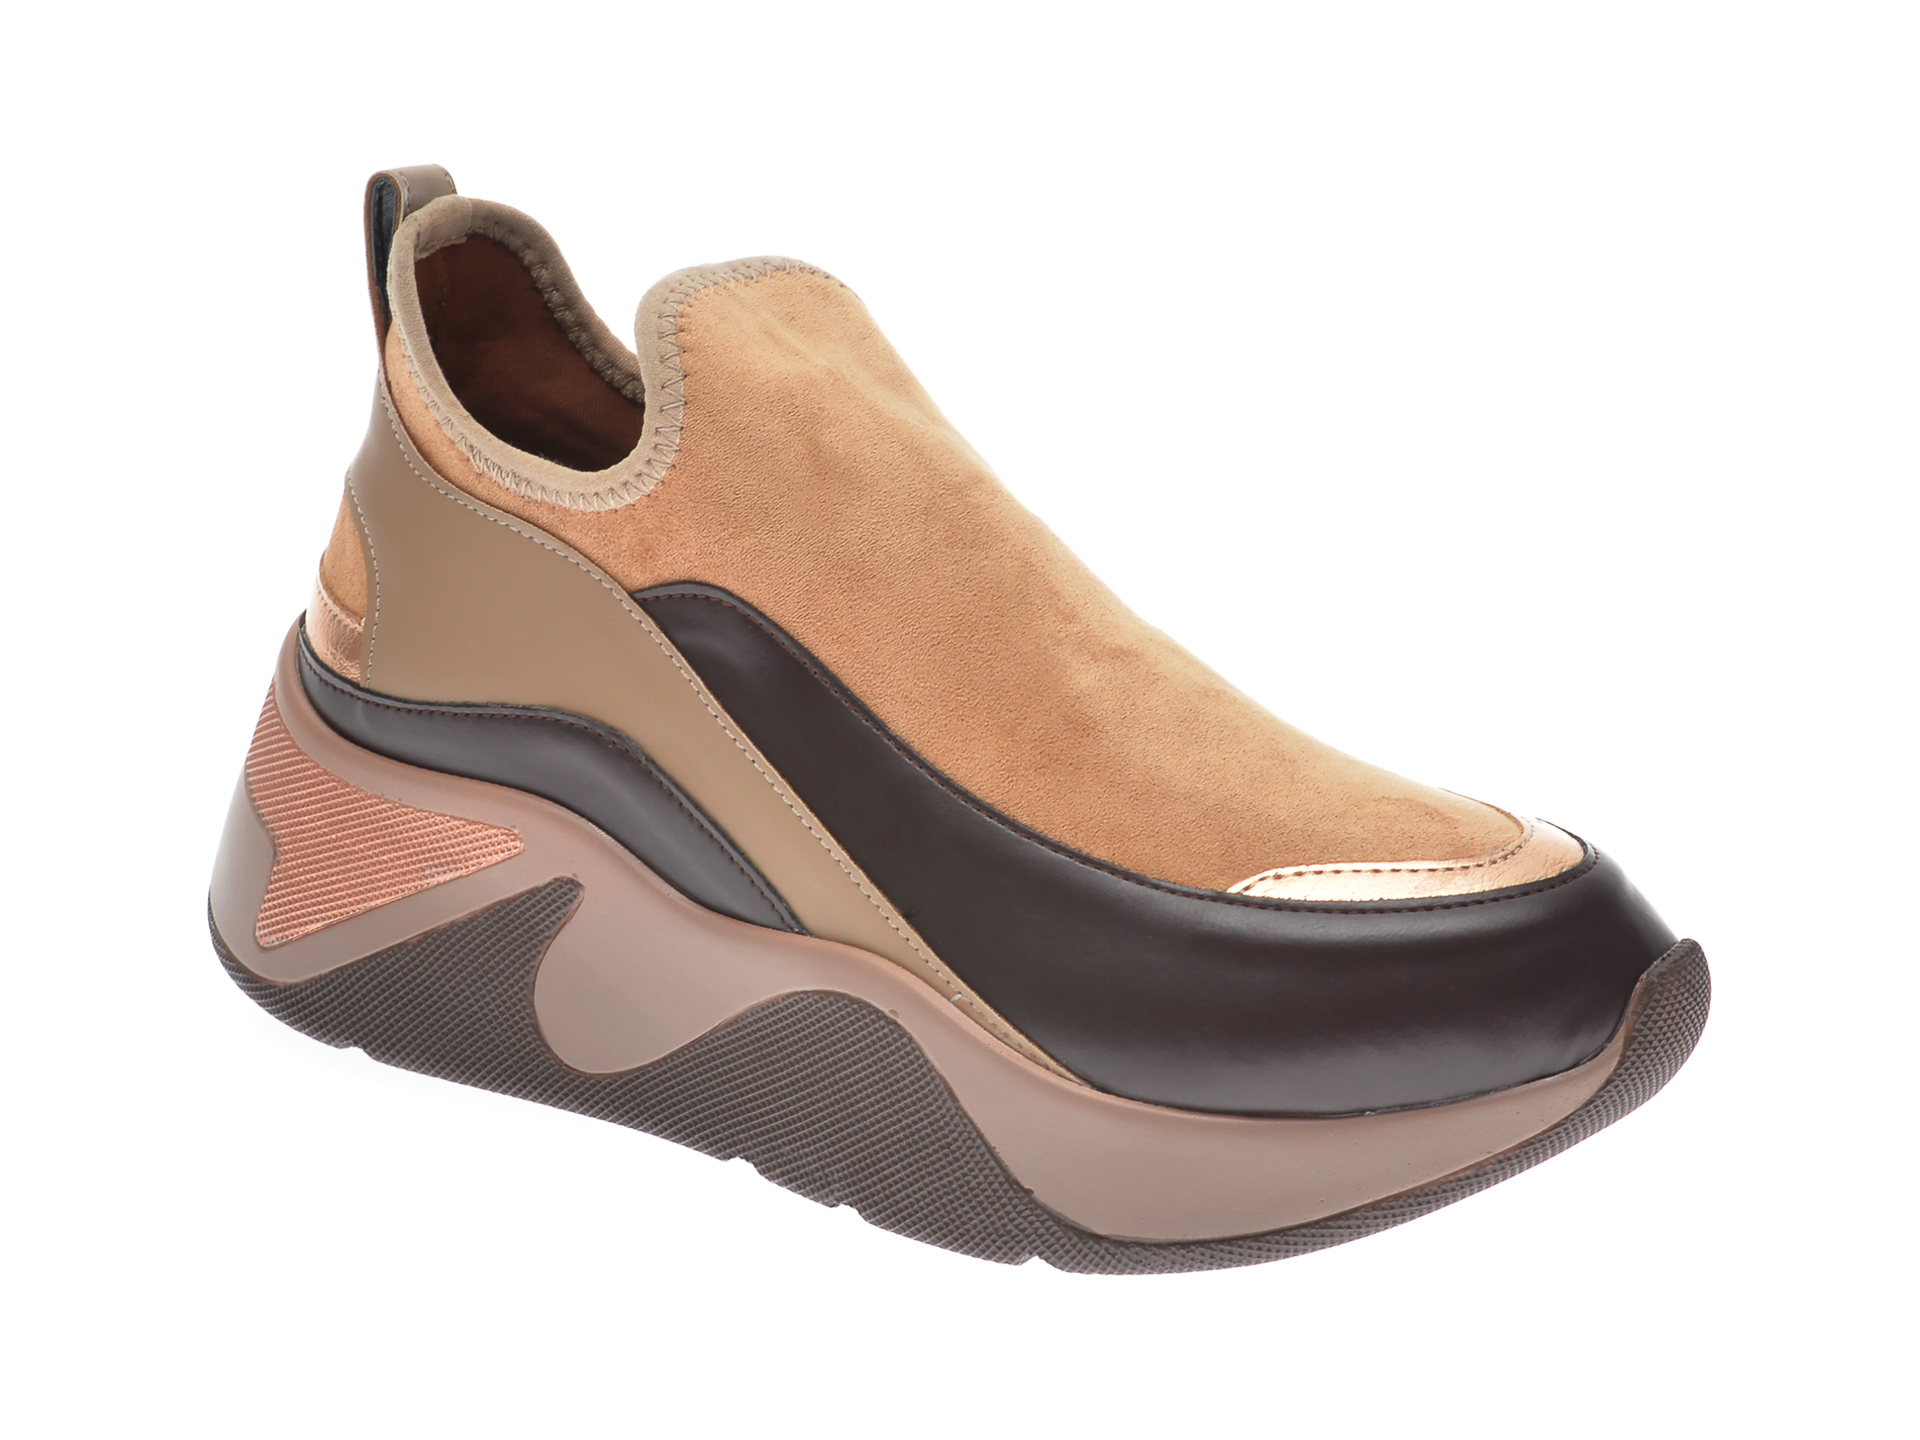 Pantofi sport GRYXX maro, MK115, din piele ecologica imagine